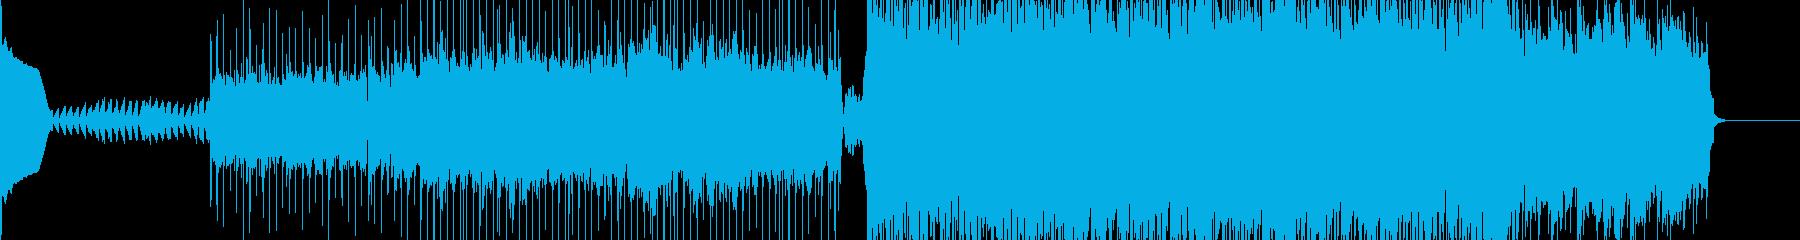 Contrast, Pt. 2の再生済みの波形